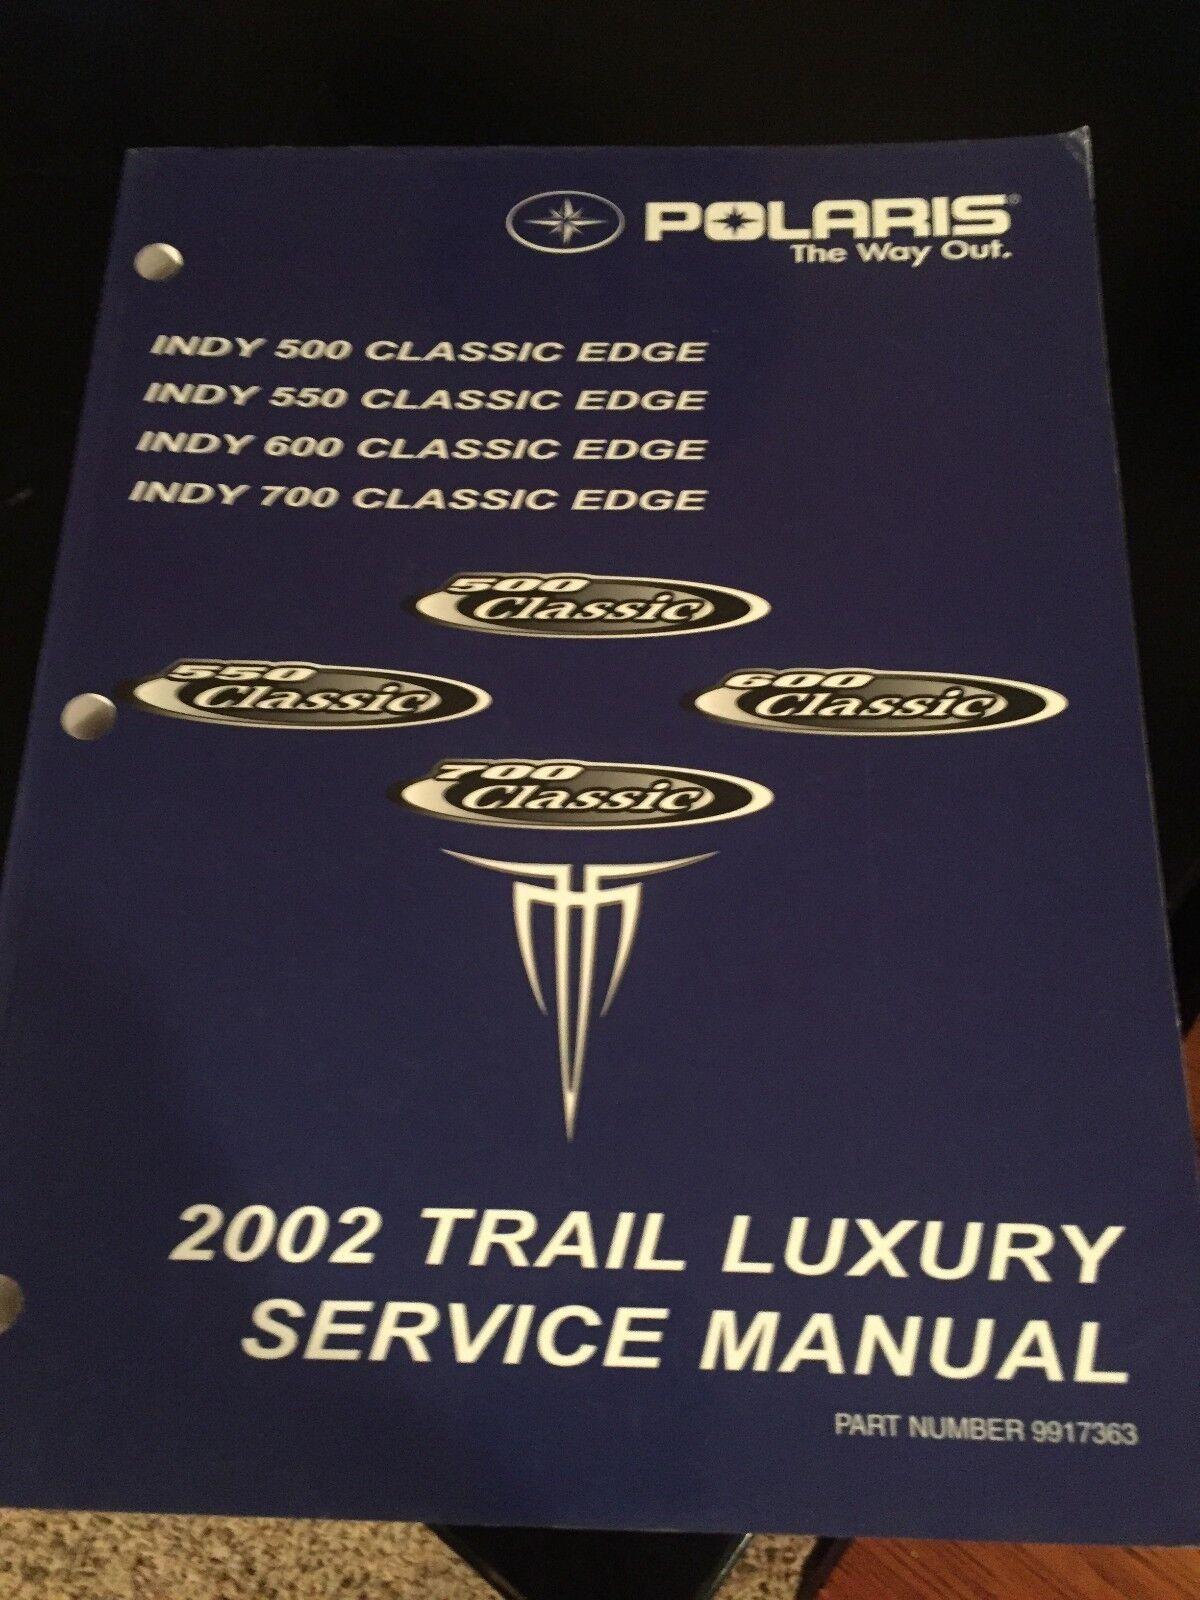 2002 Polaris Trail Luxury Snowmobile Service Manual PN  9917363